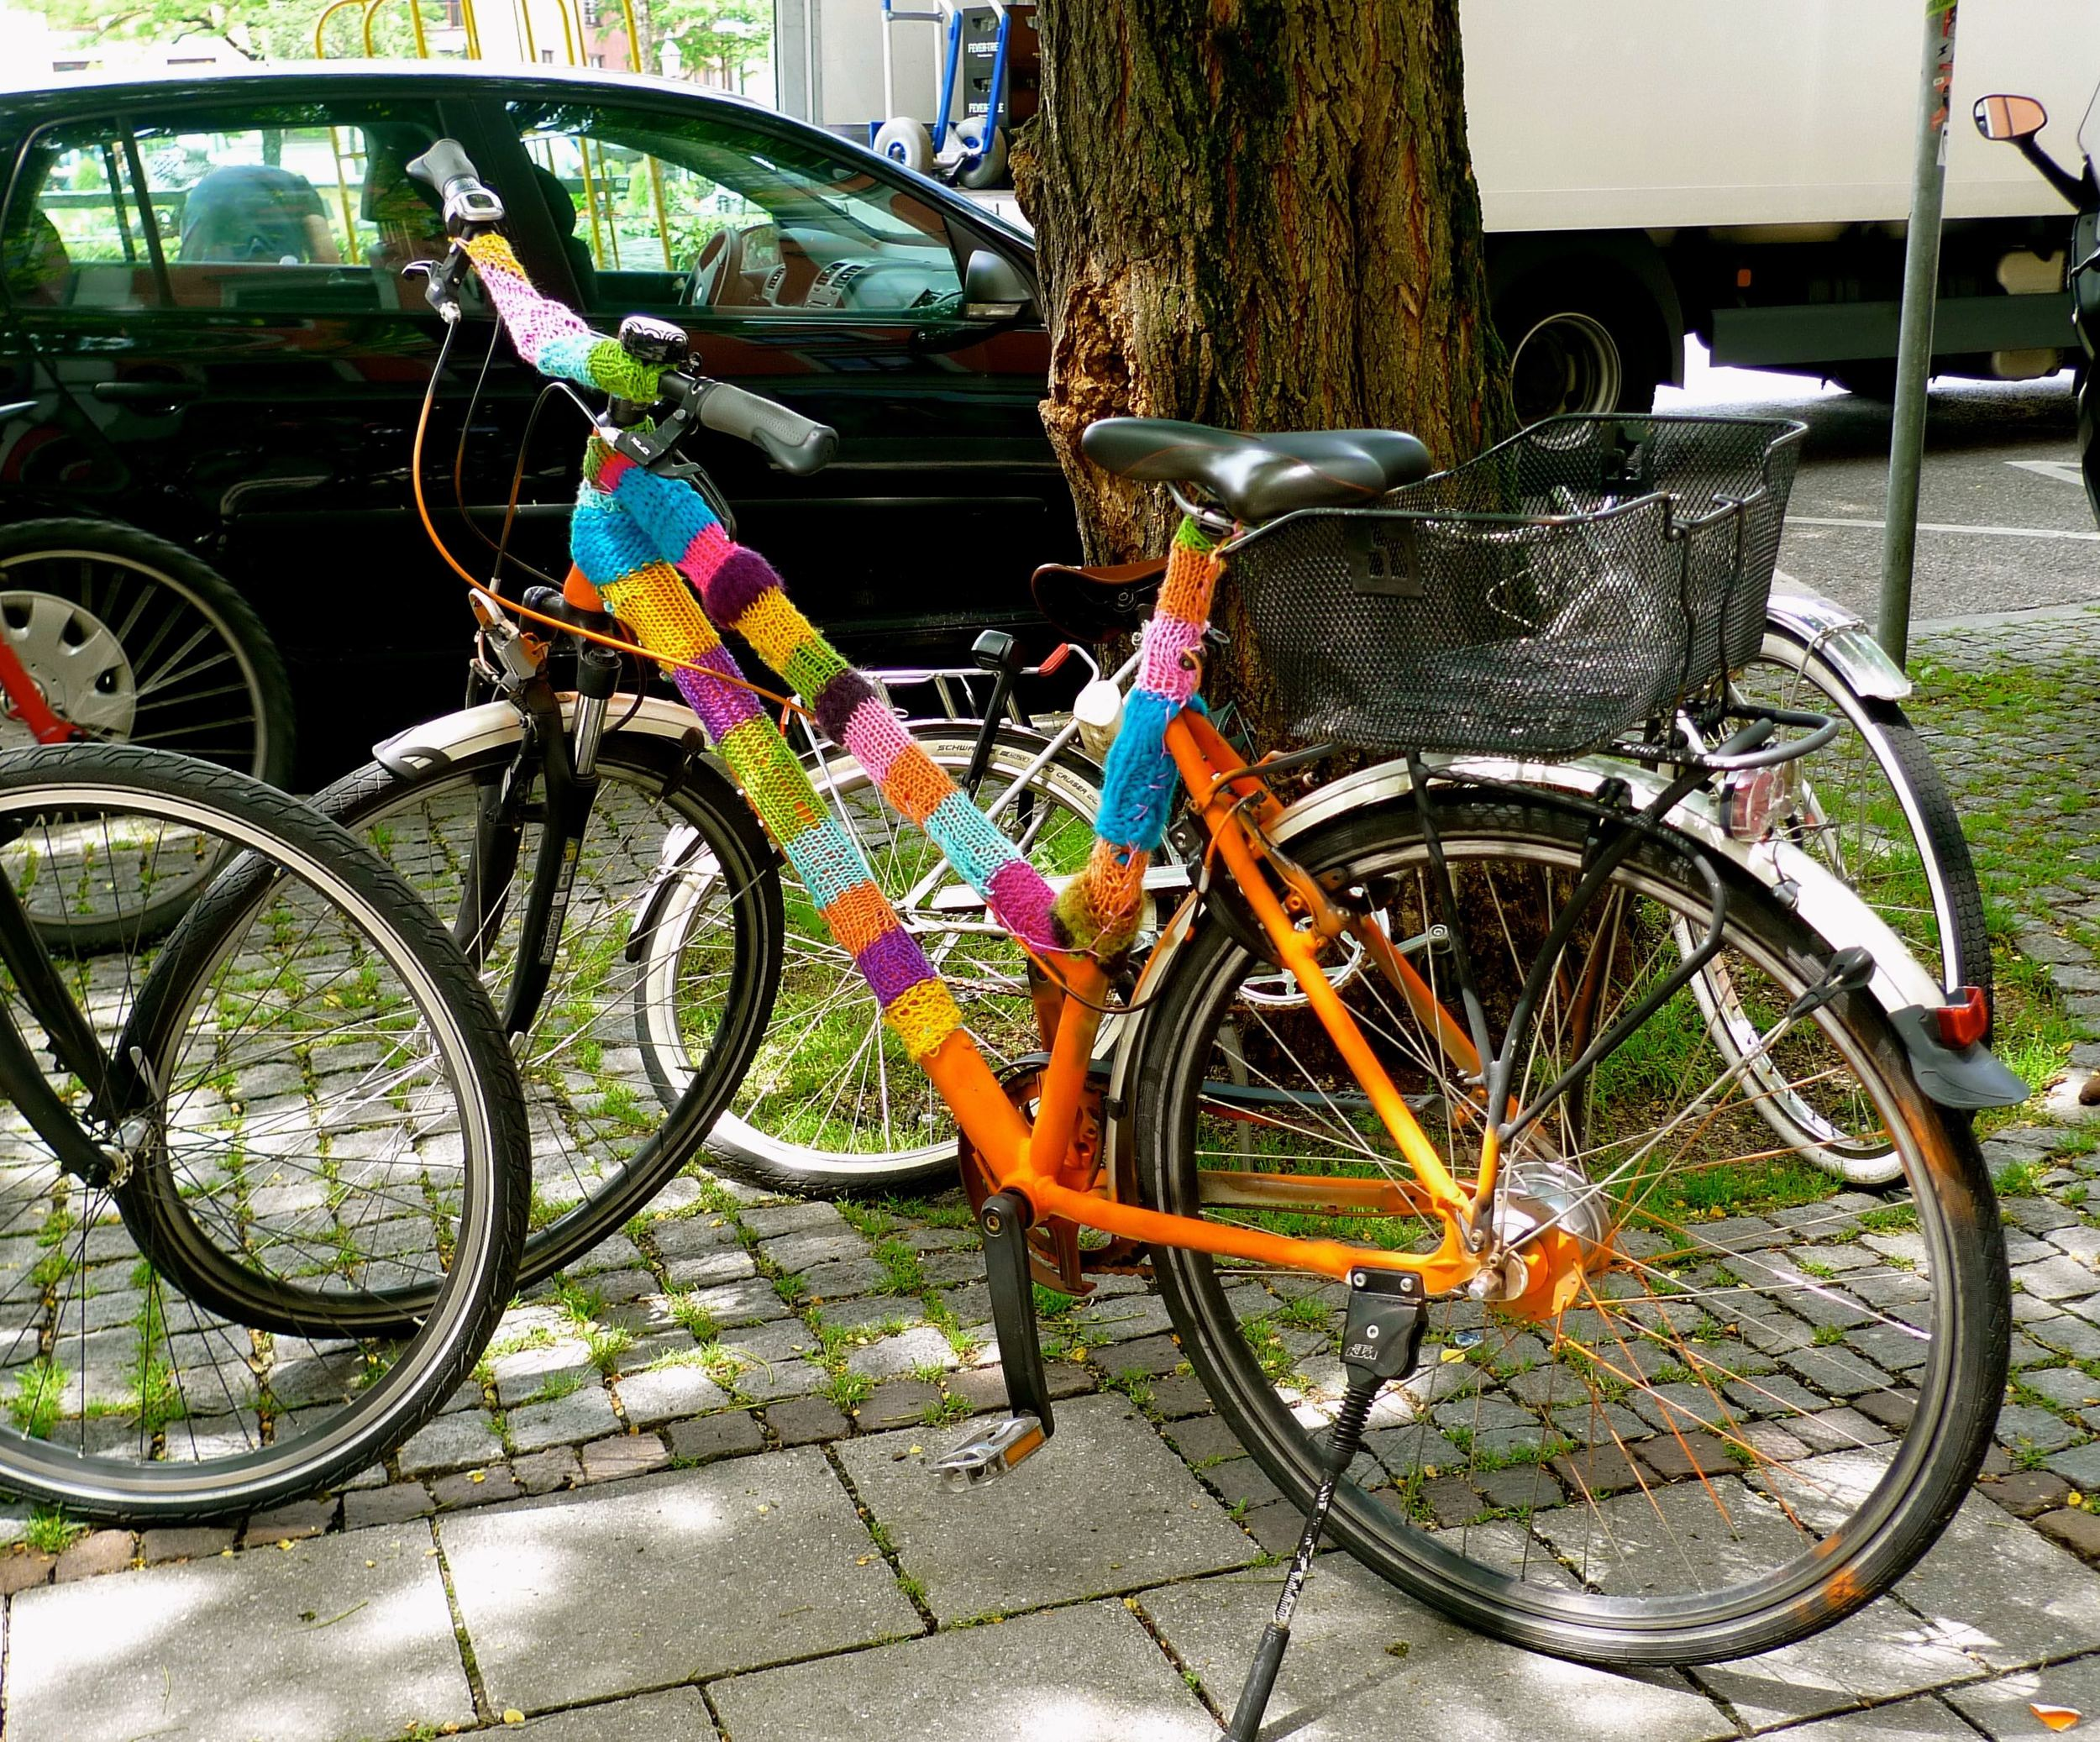 NOT MYHIRE BIKE BUT A YARN-BOMBED BIKE IN MUNICH